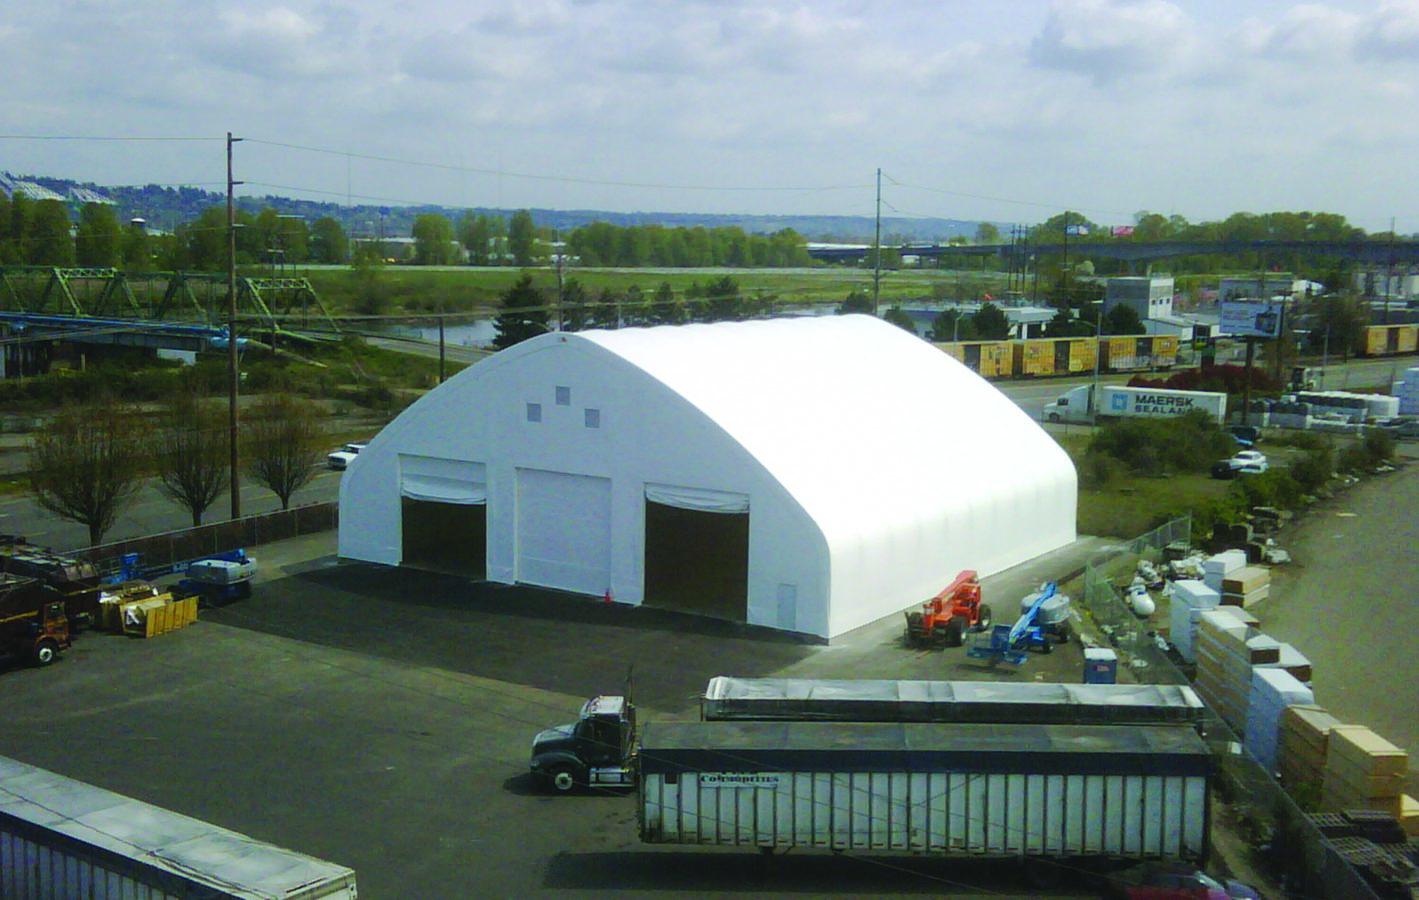 Vehicle Garage Clearspan